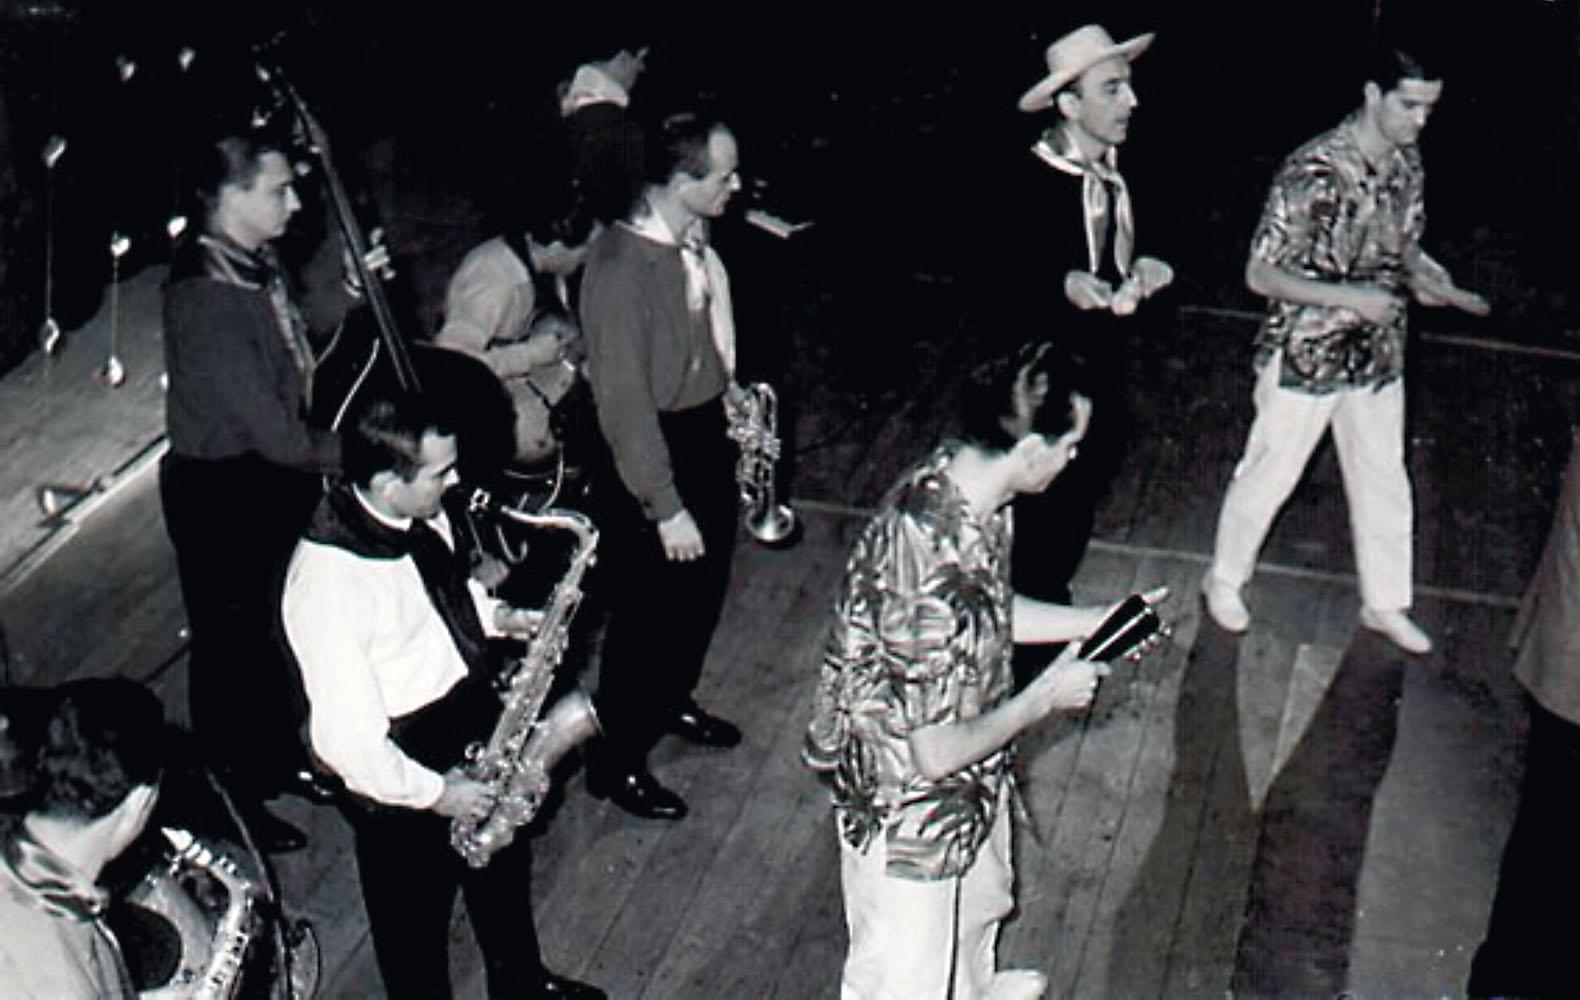 03RG 1960-61 Walasek koncert-ed1